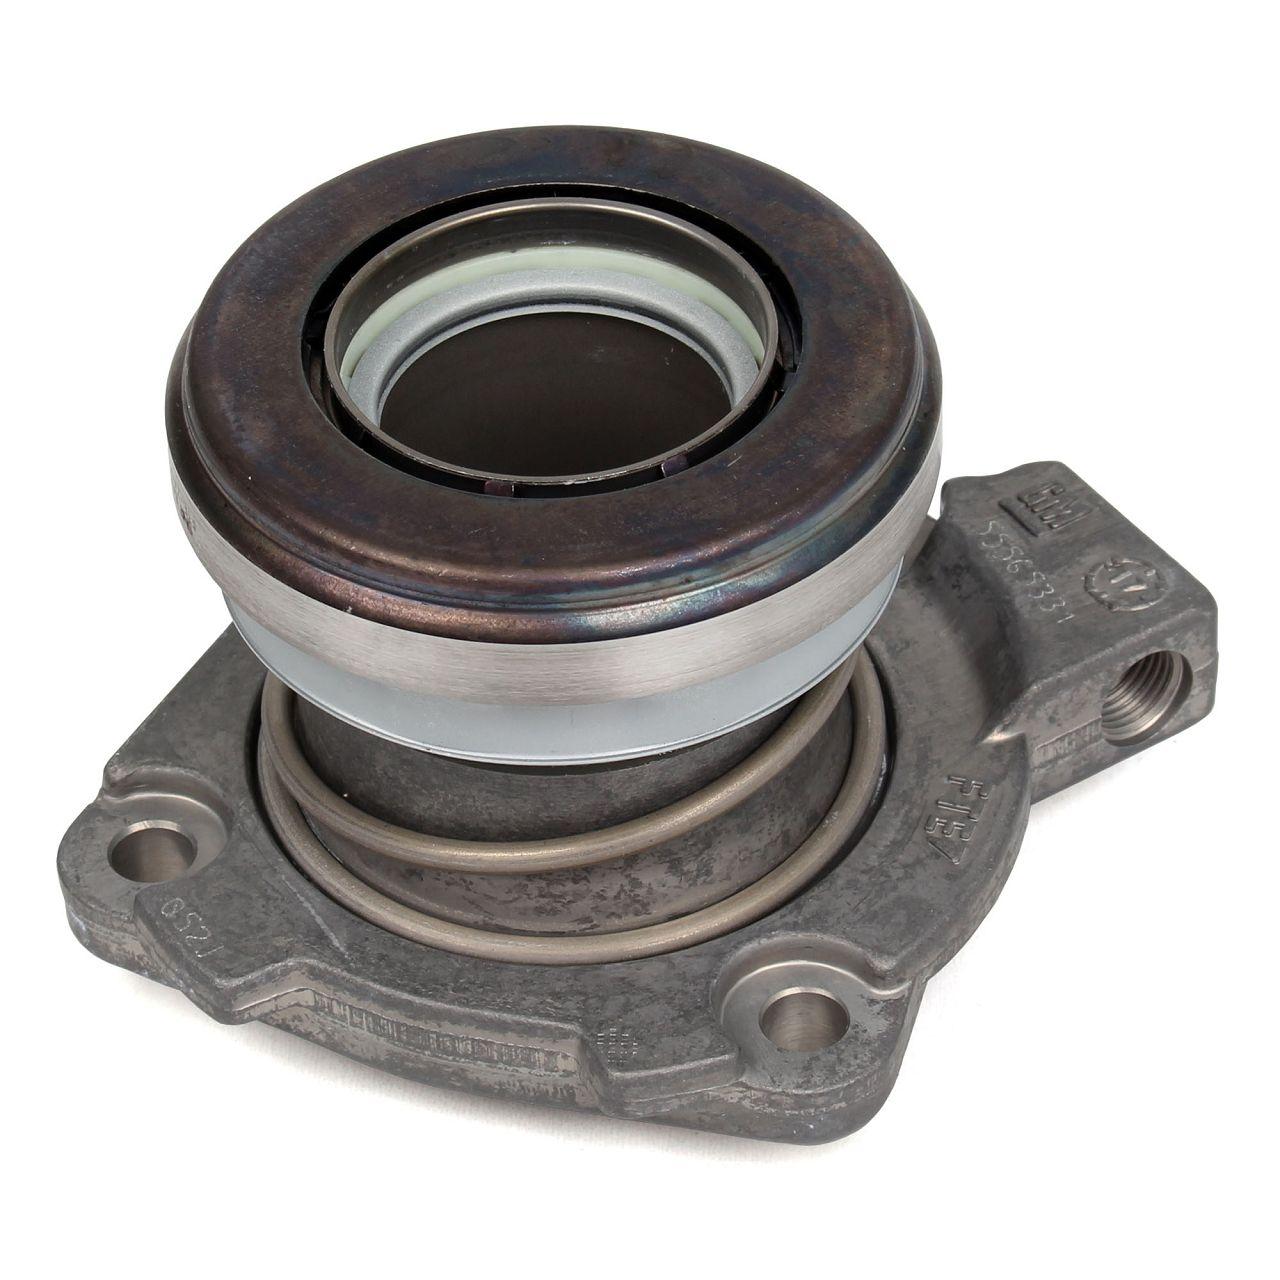 Nehmerzylinder Ausrücklager Getriebetyp F40 OPEL Astra J Insignia A 679080 / 55565331